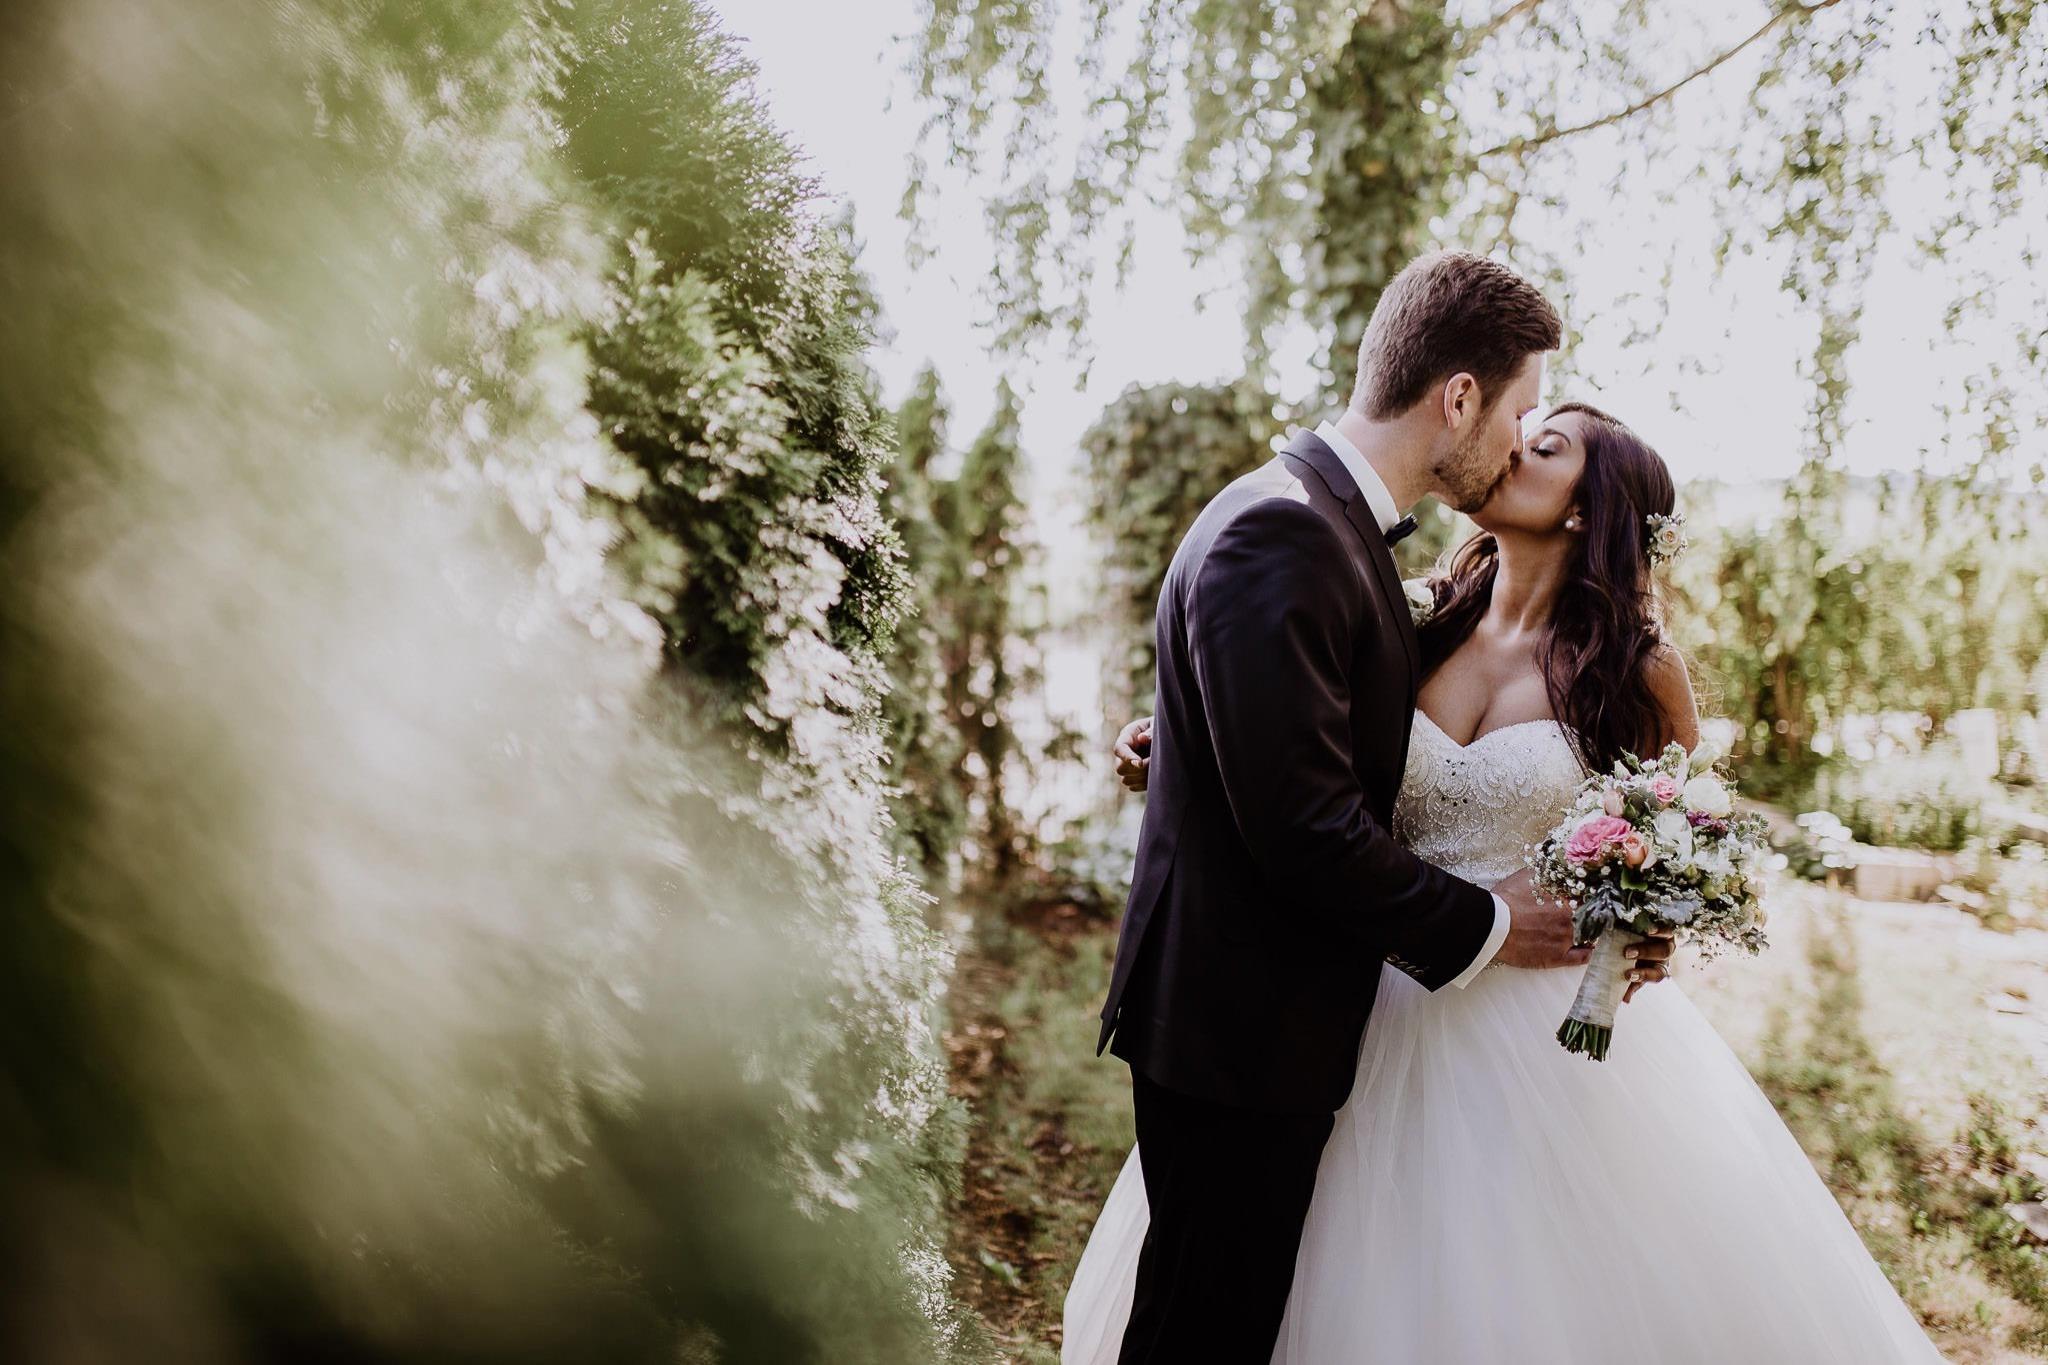 wedding photographer hamilton new zealand 1035 1